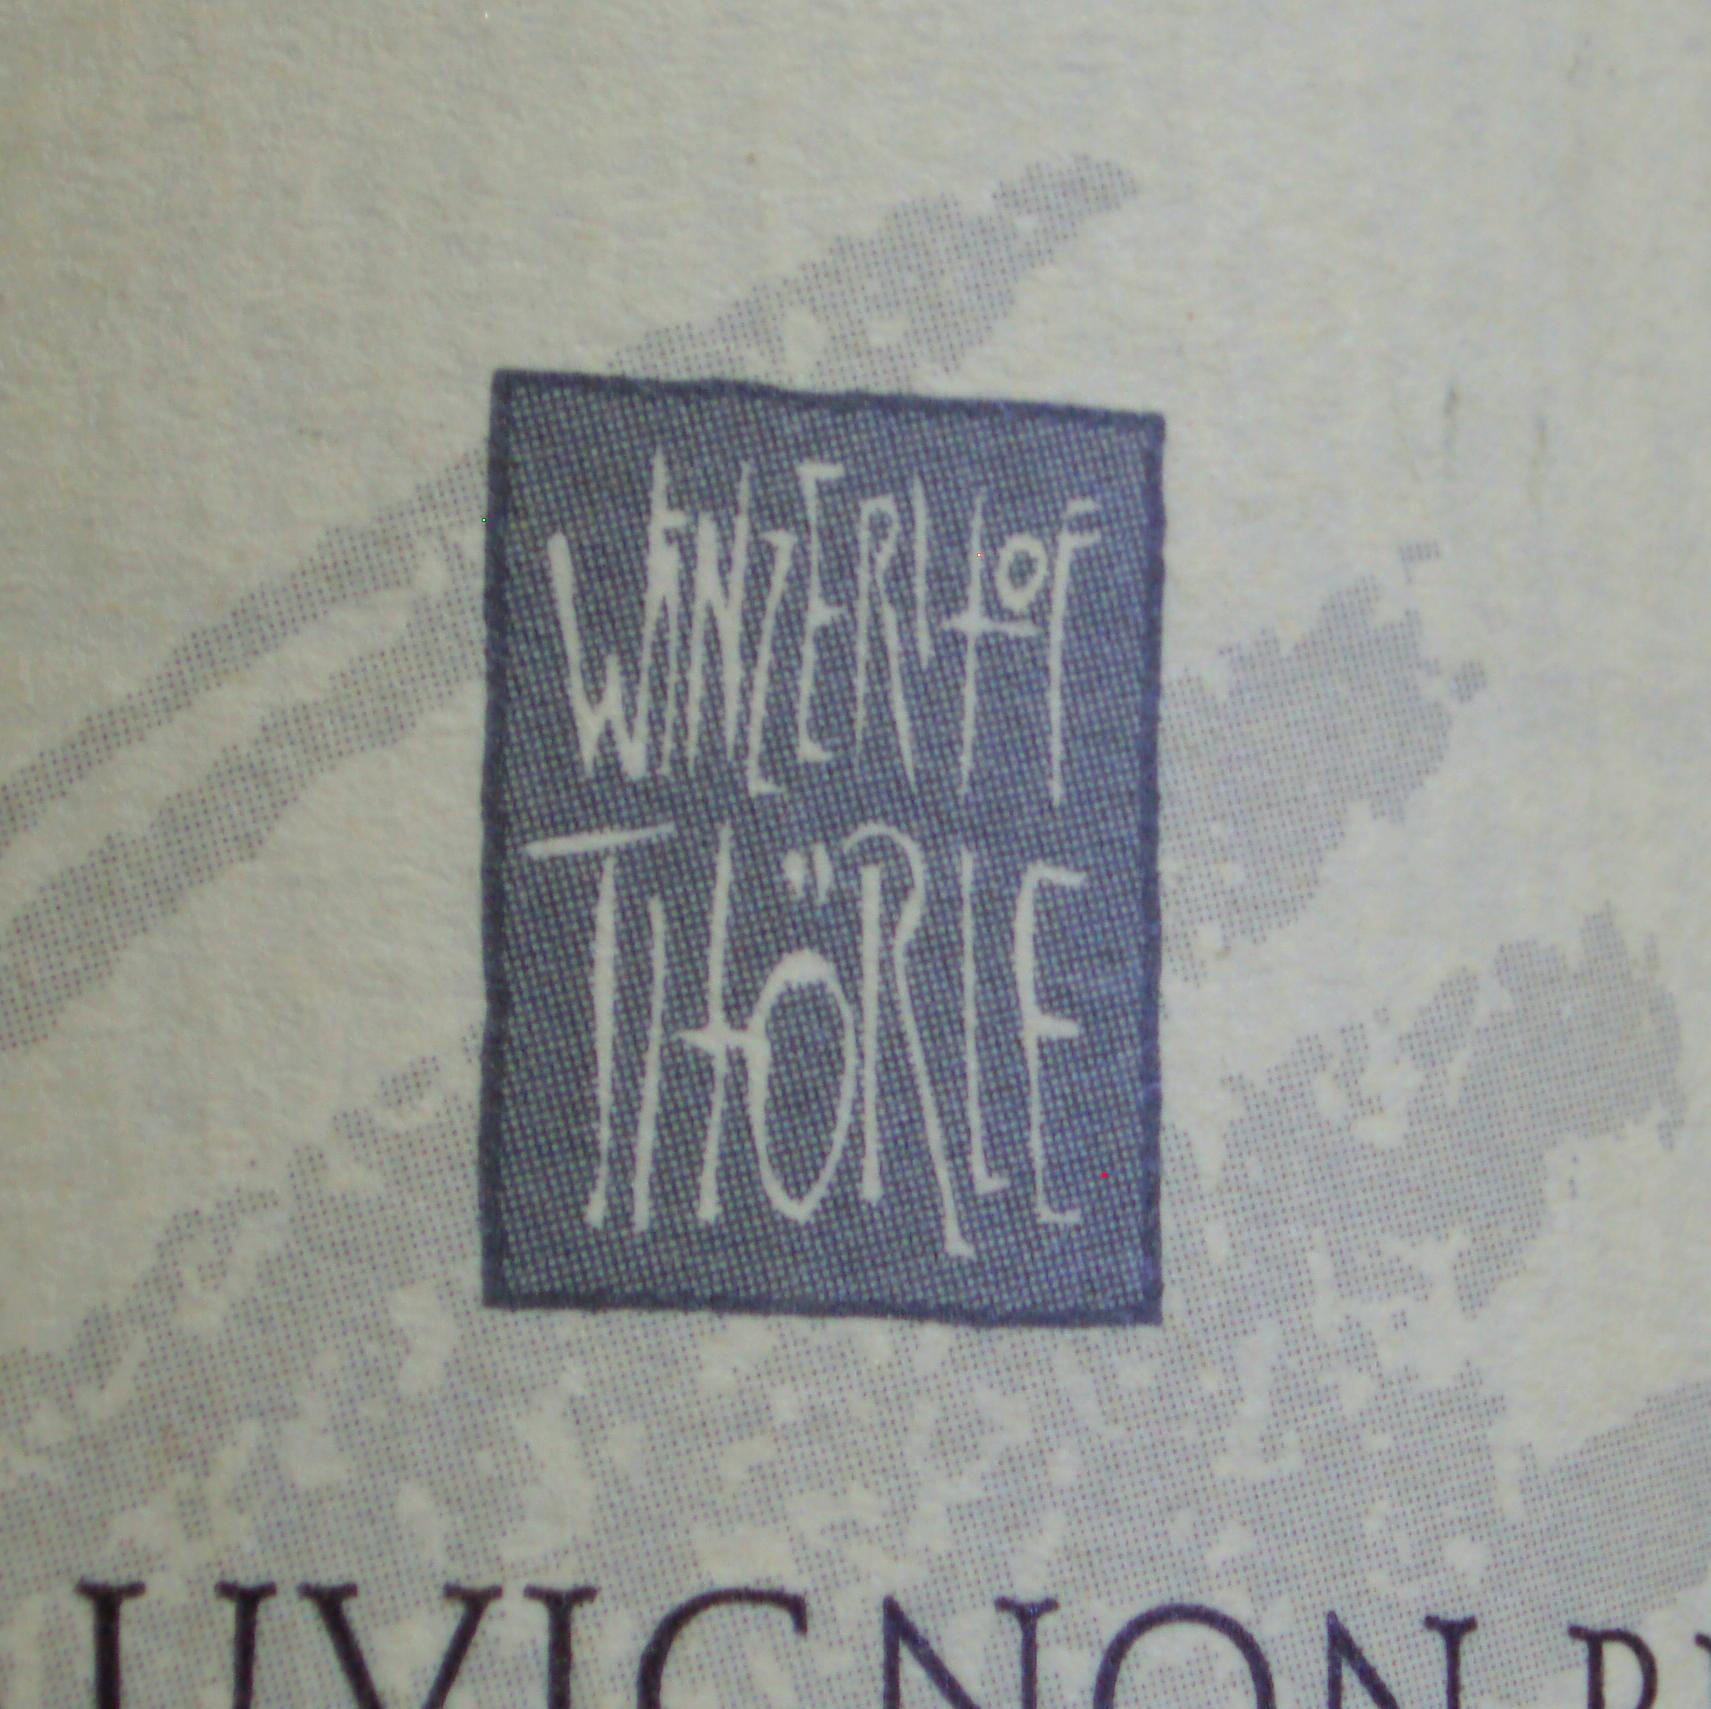 2008 Sauvignon Blanc trocken Winzerhof Thörle Saulheim thumb